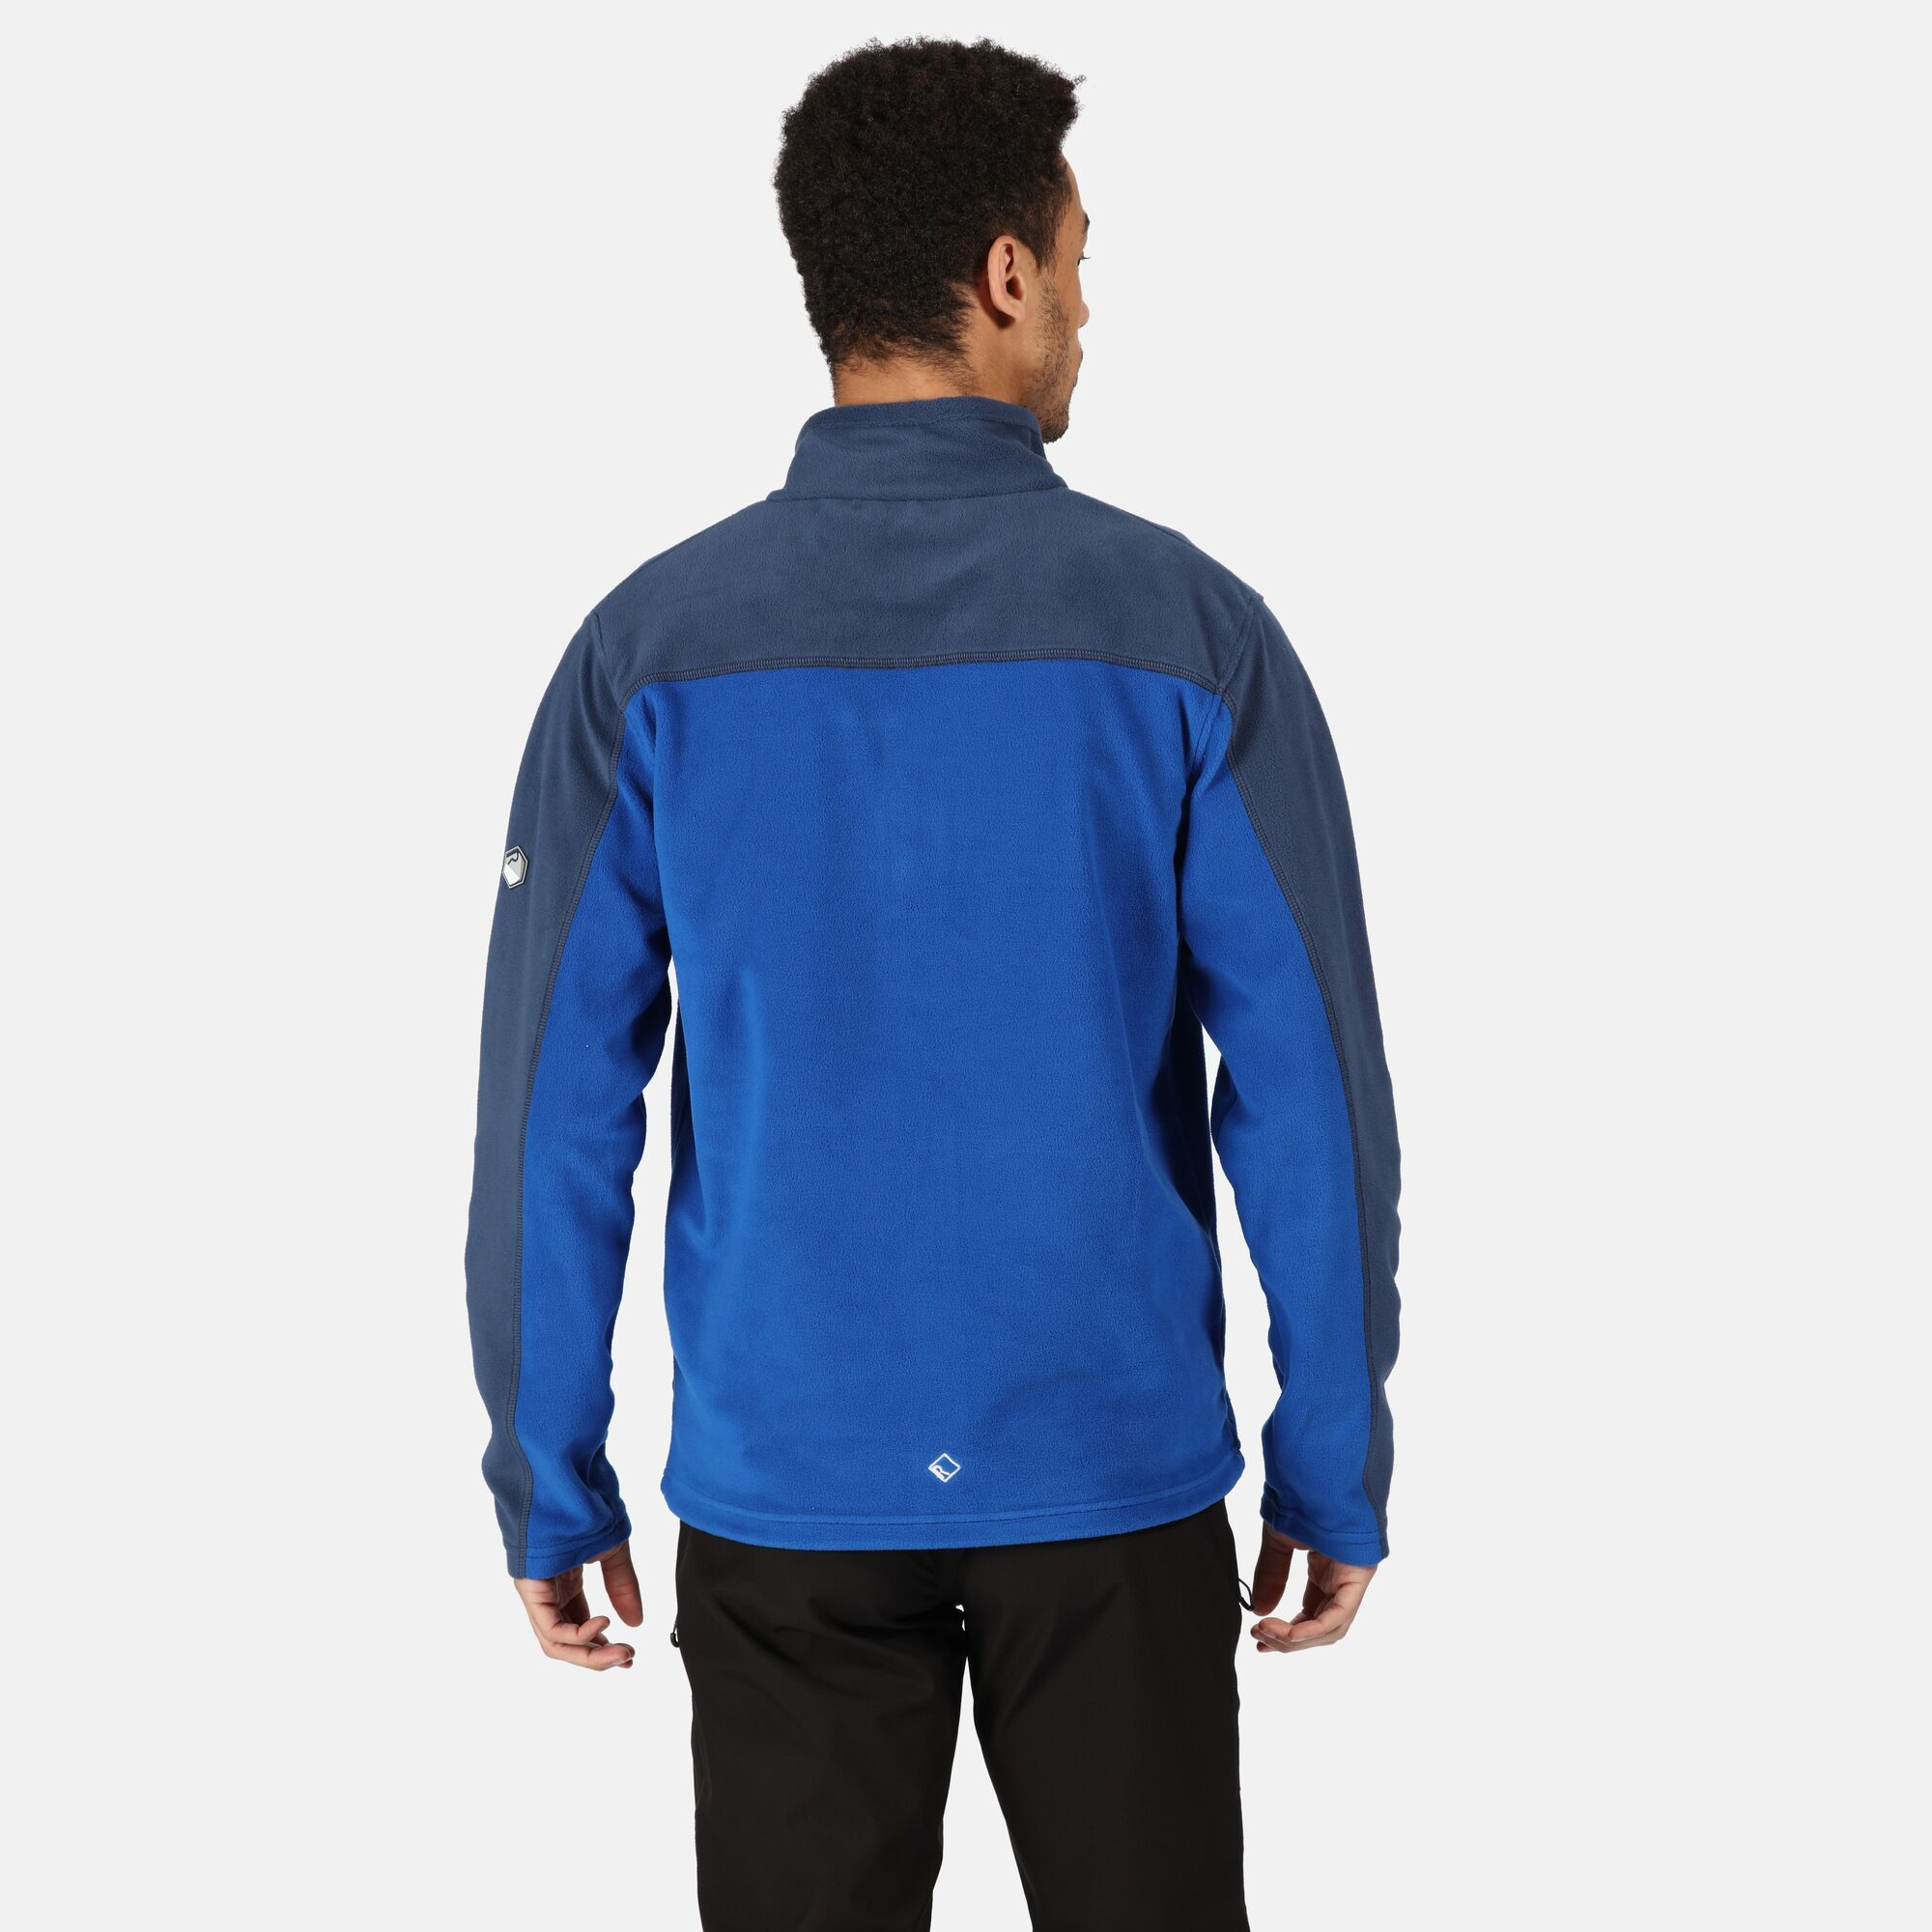 thumbnail 3 - Regatta Fellard Mens Lightweight Full Zip Warm Walking Fleece Jacket RRP £30